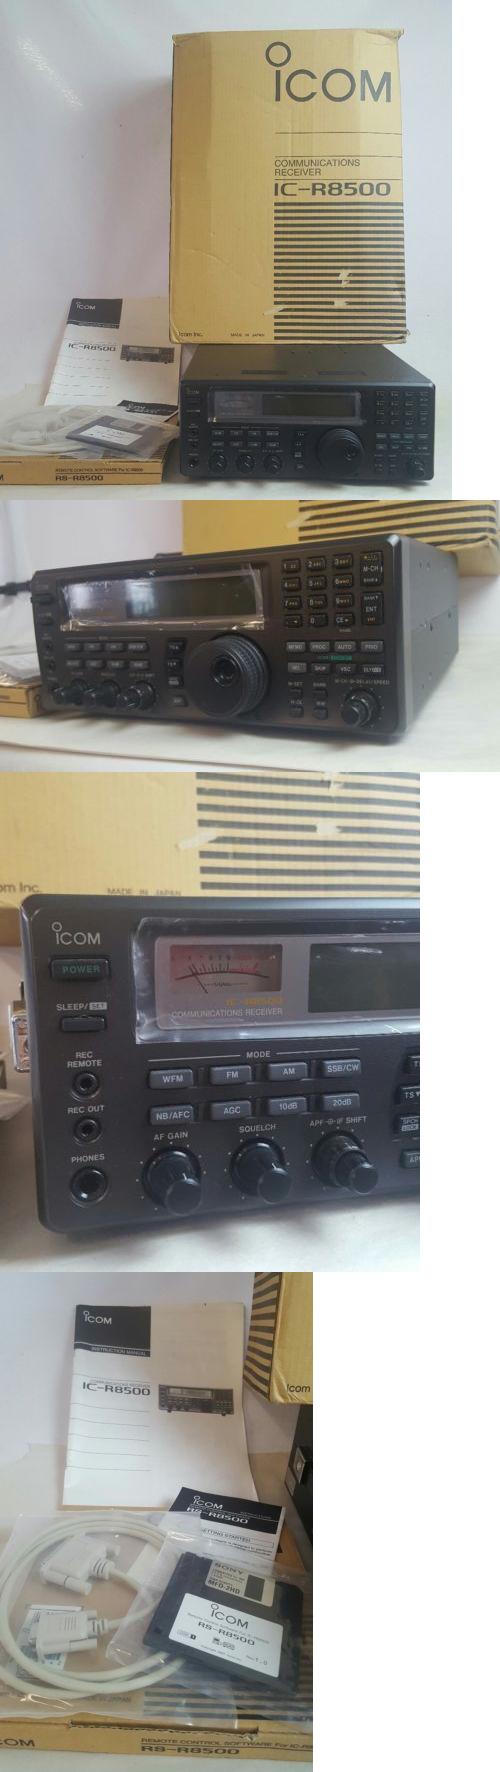 Ham Radio Receivers: Icom Ic-R8500 Shortwave Am Fm Ssb Receiver 100Khz - 1999.99 Mhz New!!! -> BUY IT NOW ONLY: $1500 on eBay!